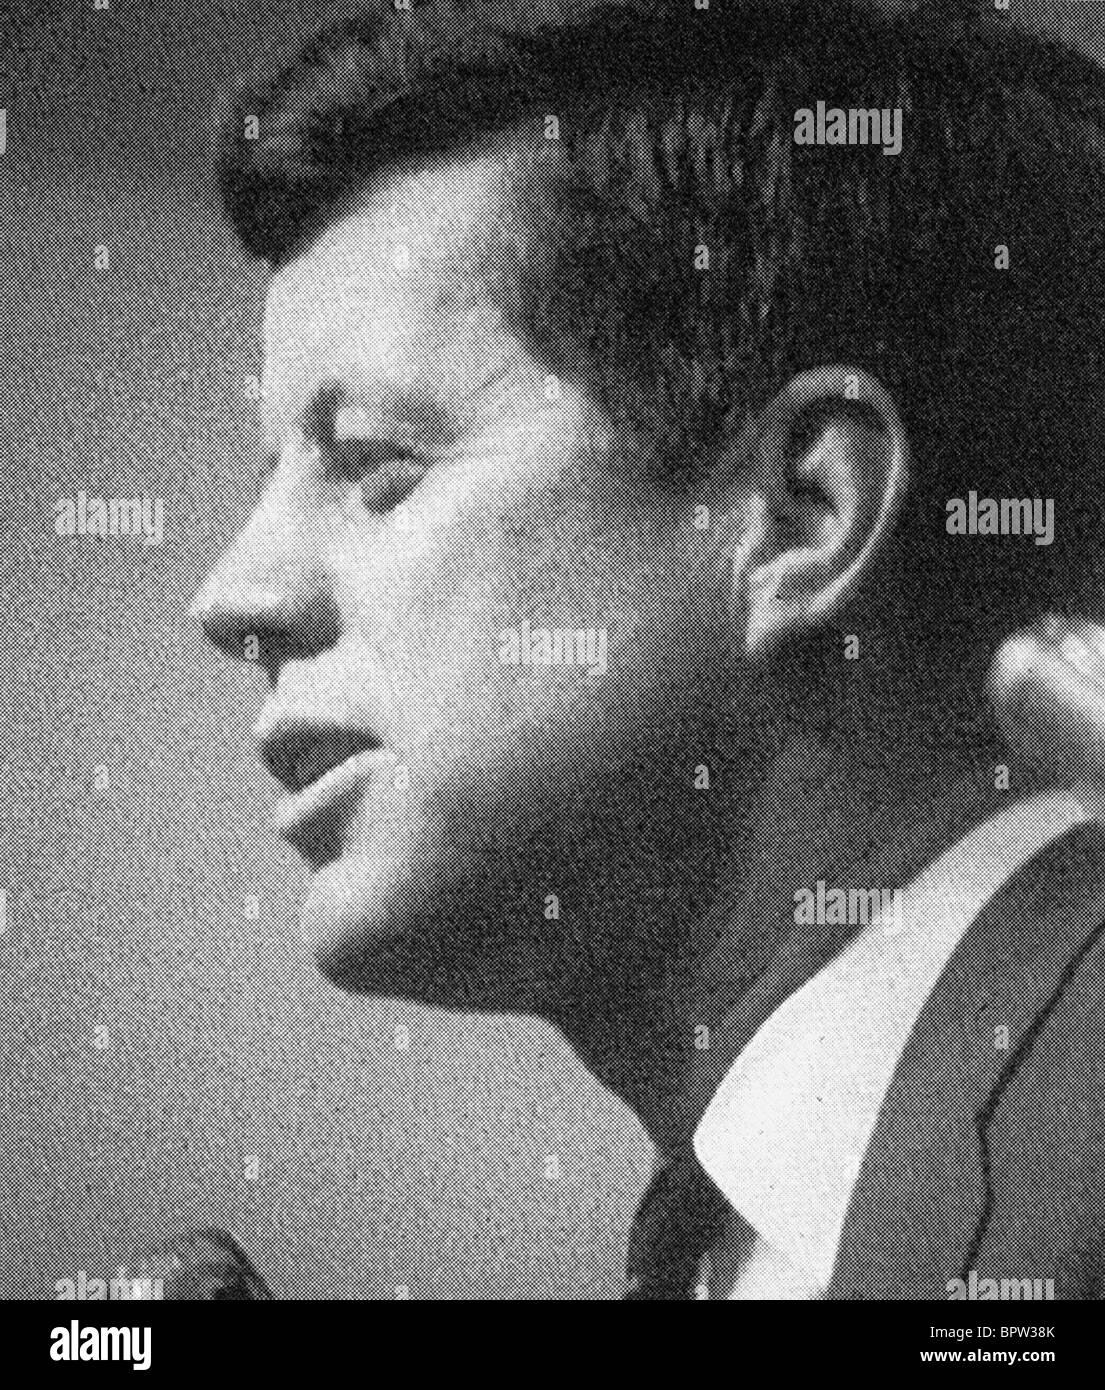 JOHN F. KENNEDY PRESIDENT OF THE UNITED STATES 01 June 1960 Stock Photo